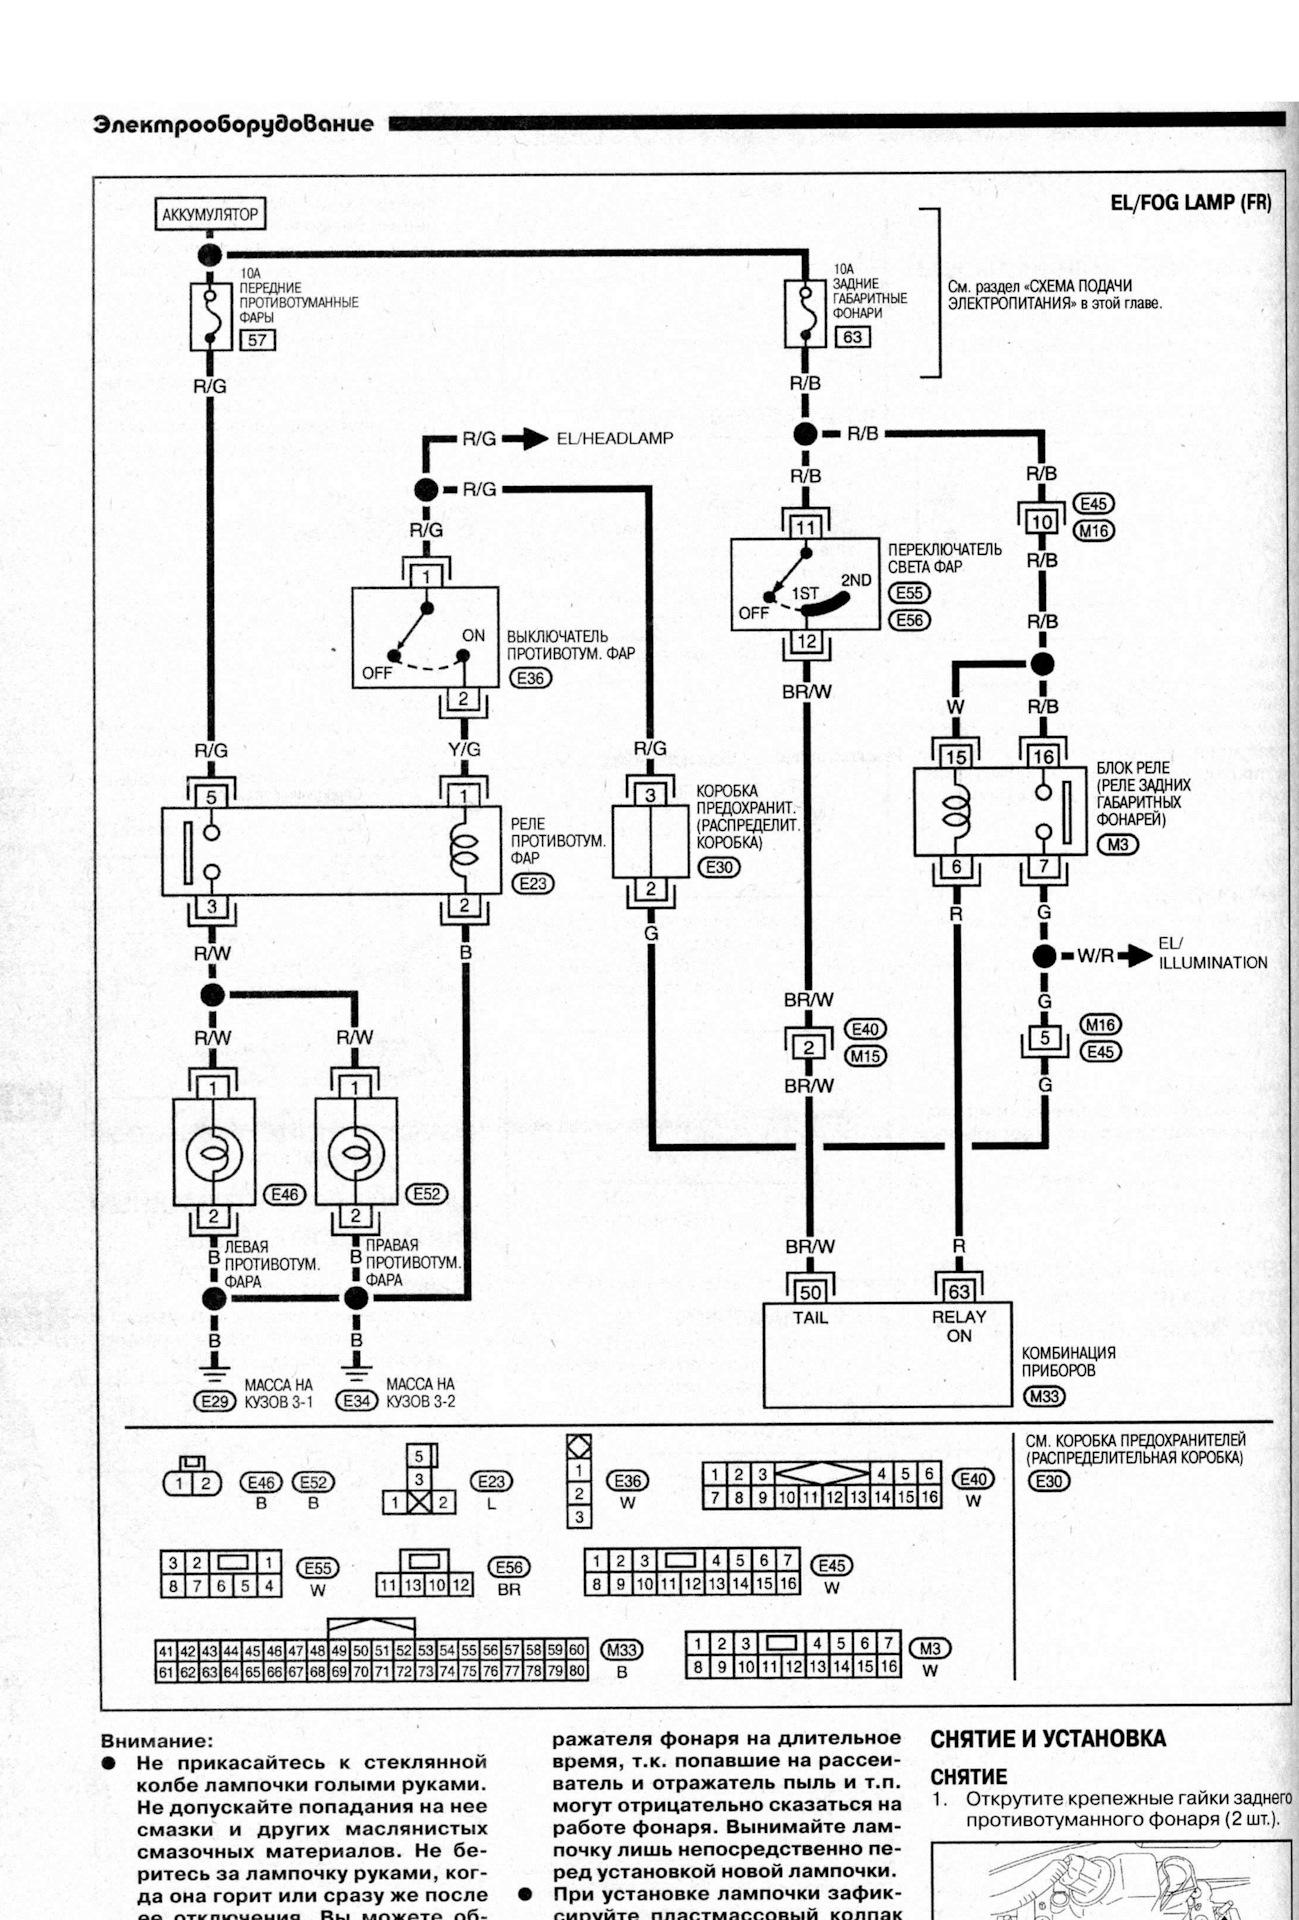 2005 nissan almera radio wiring diagram 2002 honda civic car stereo n16 and